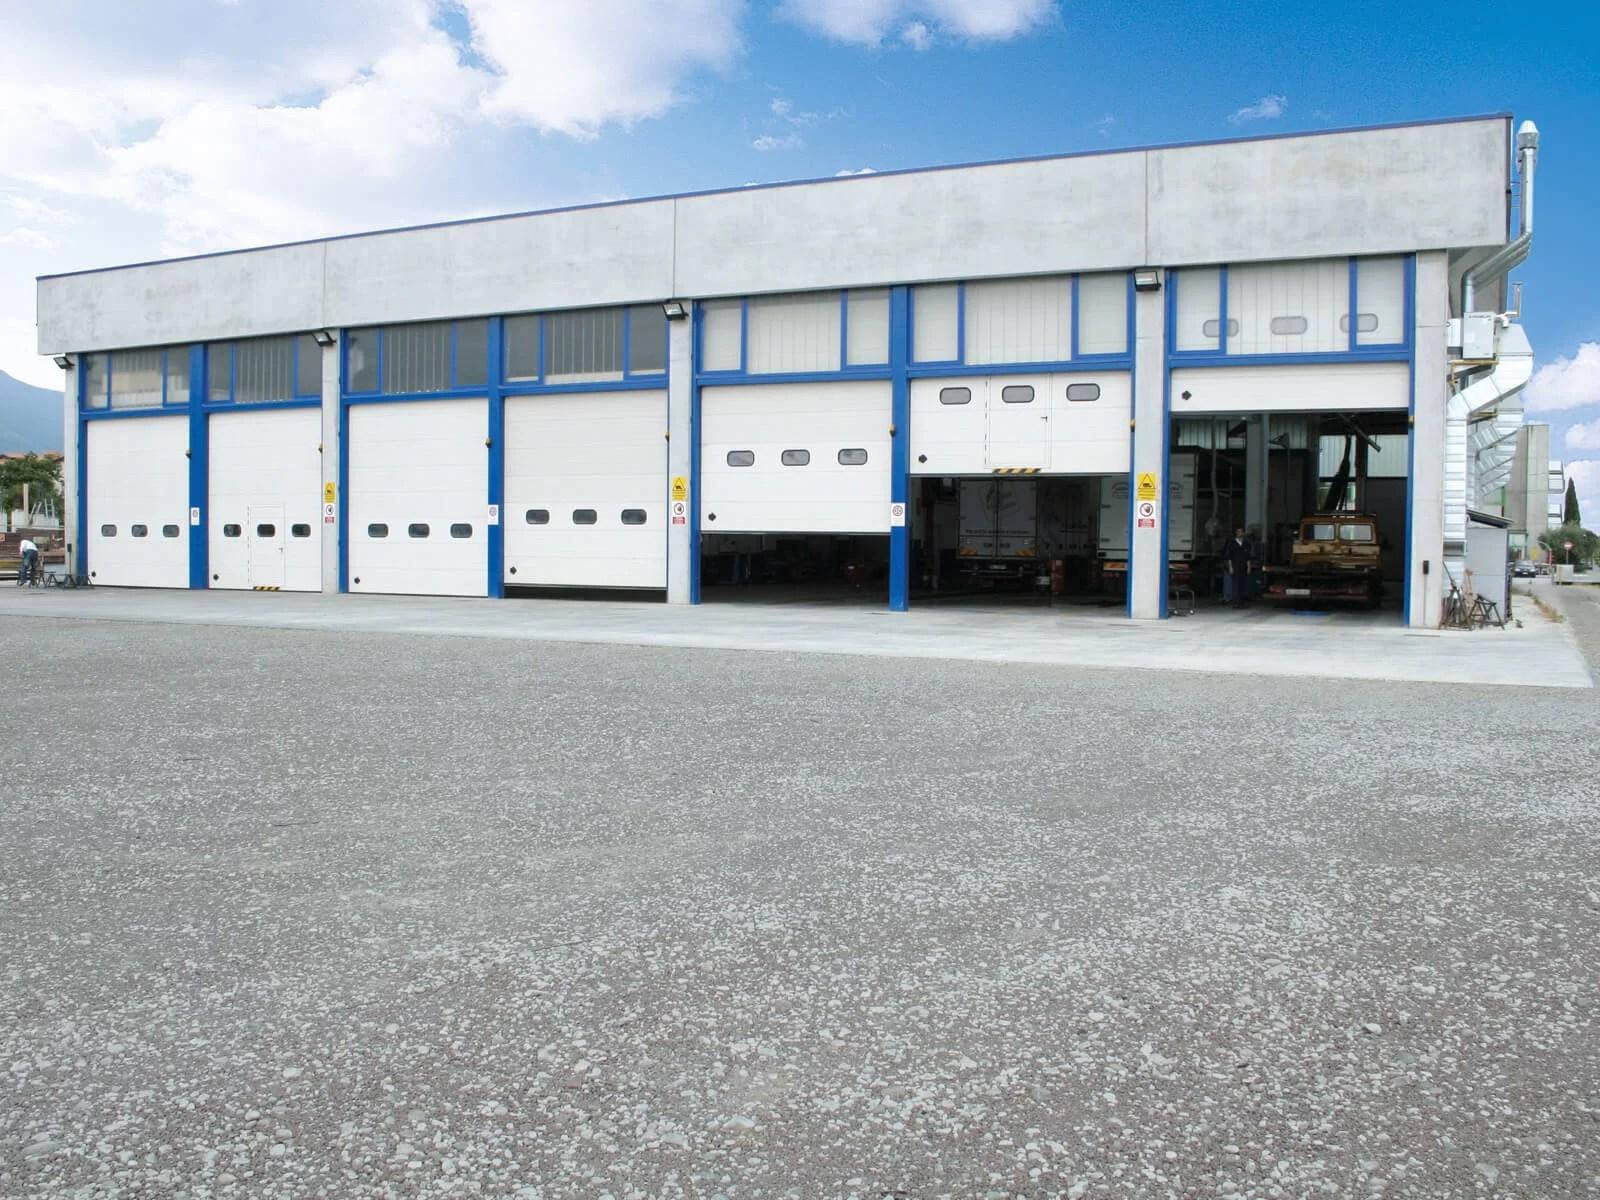 Portone sezionale industriale SECURA - Stucco bianco C21